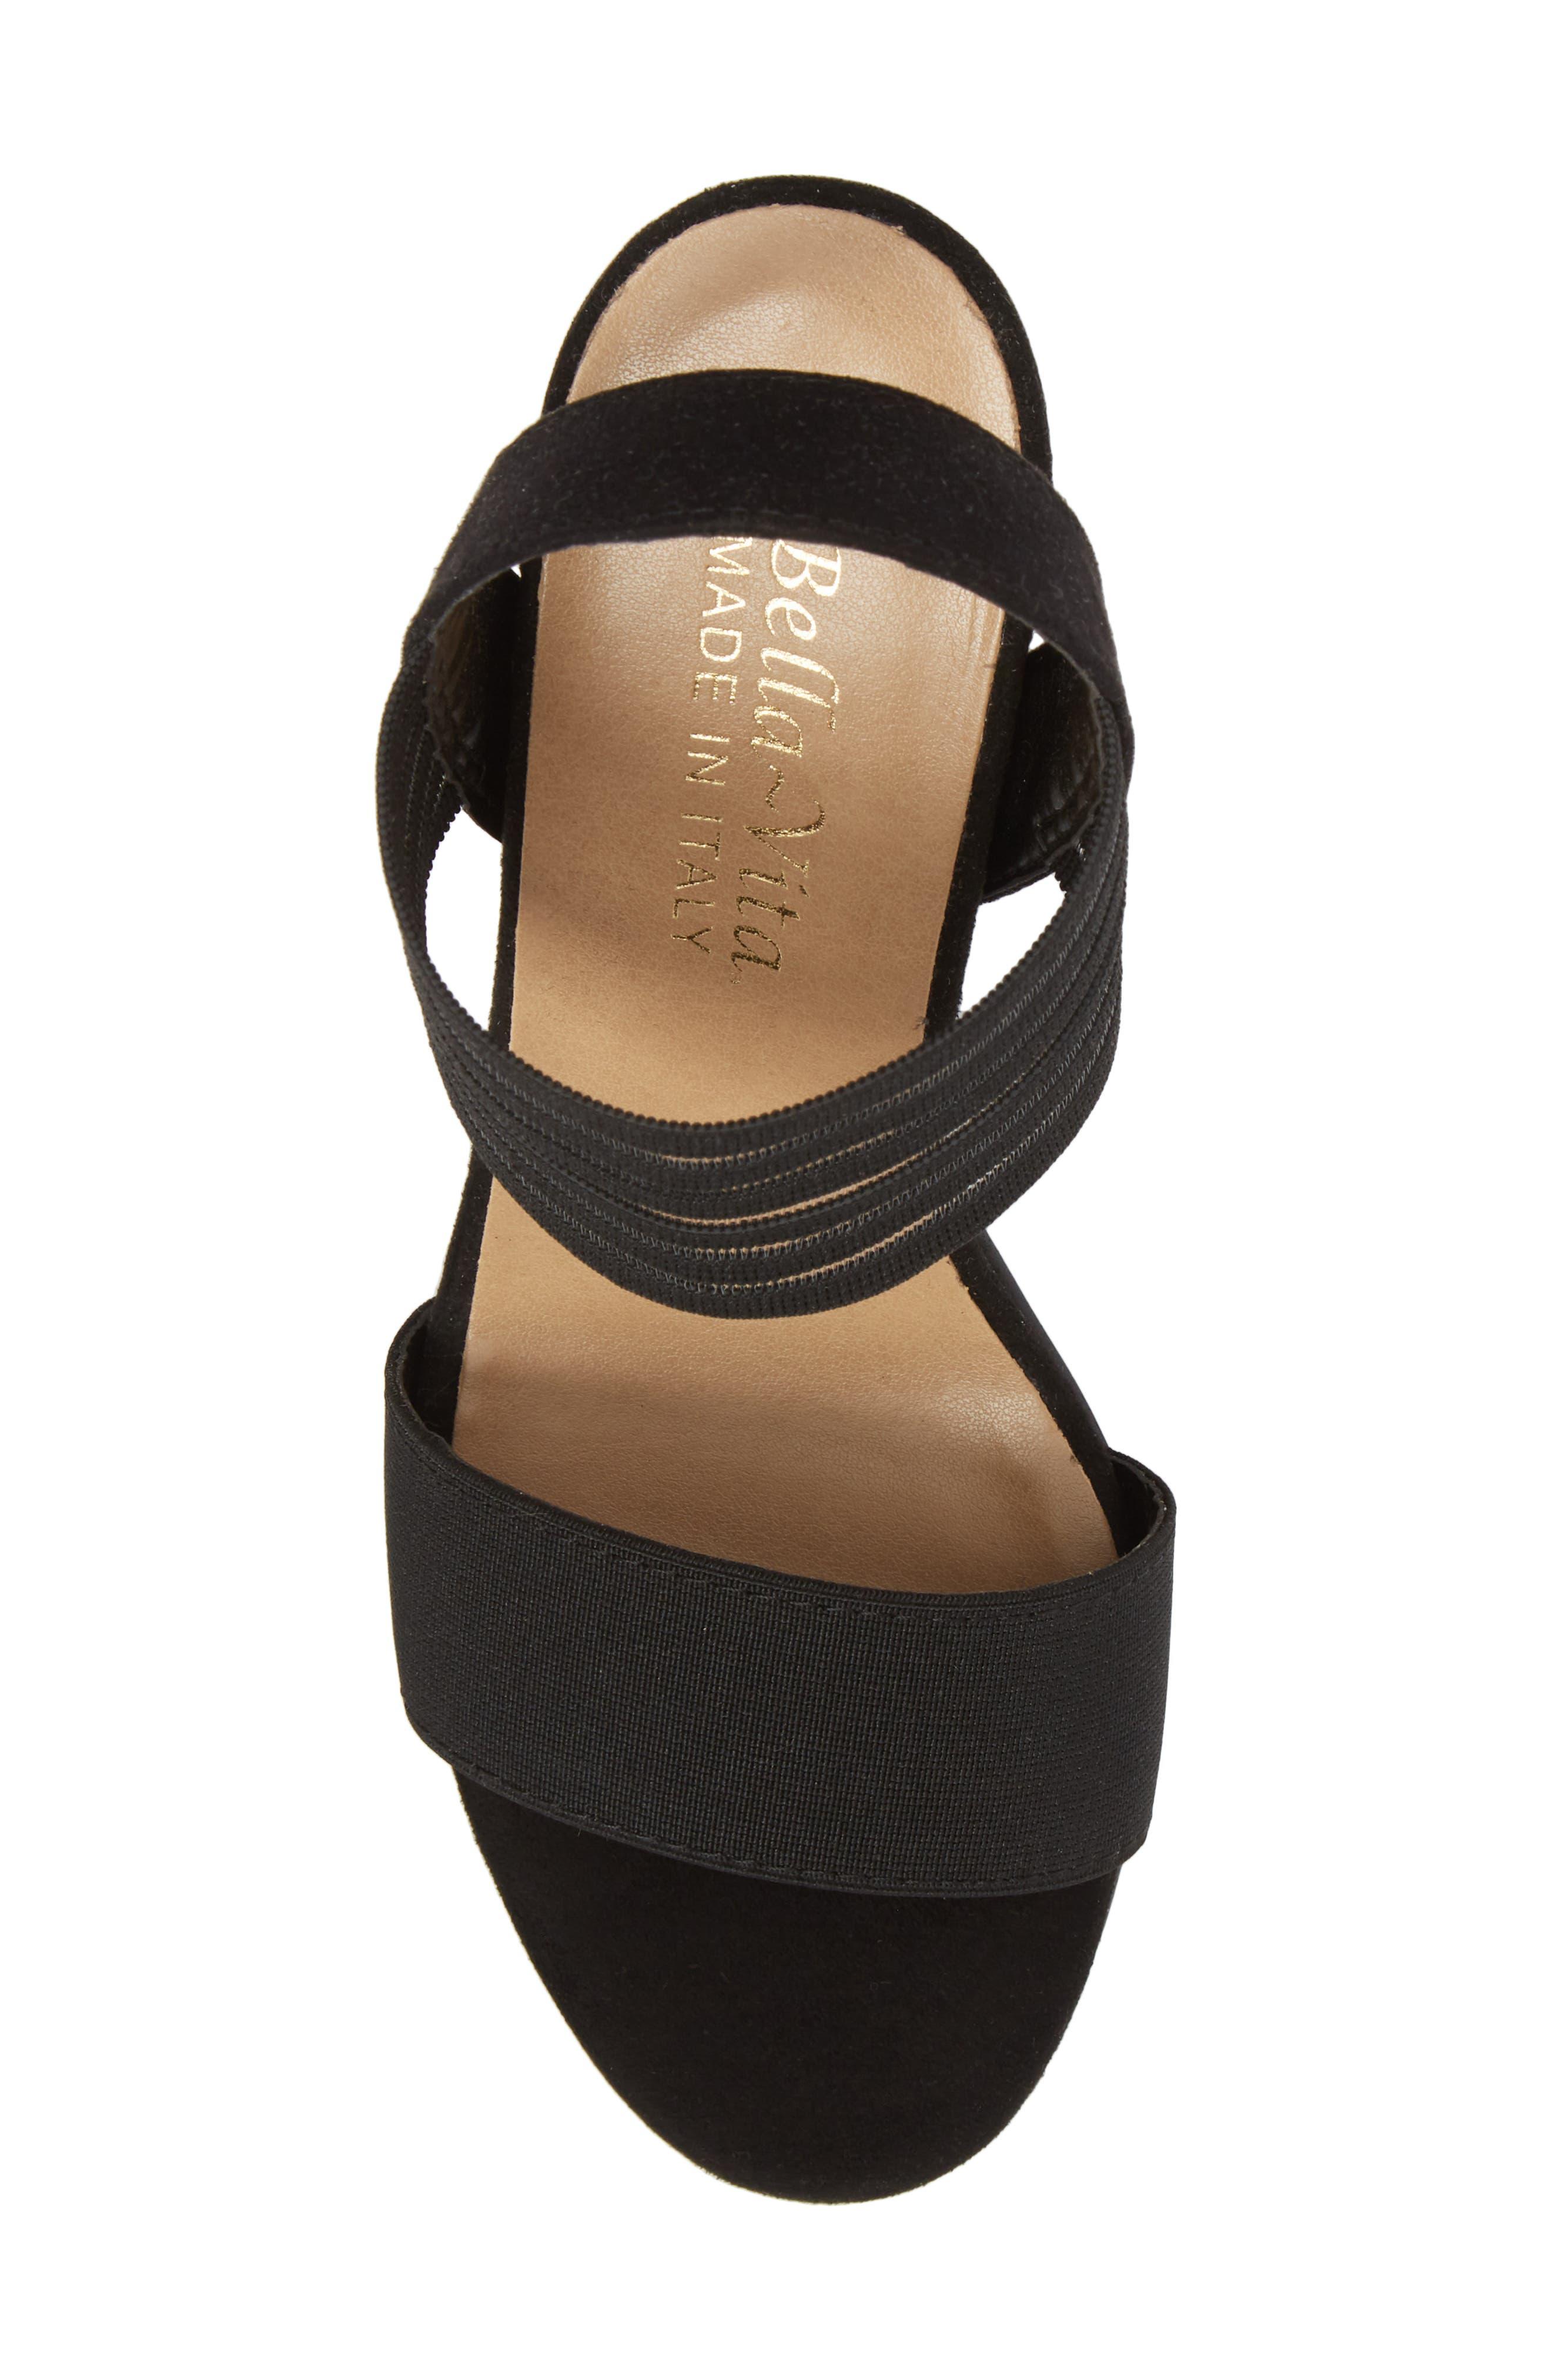 Dan Block Heel Sandal,                             Alternate thumbnail 5, color,                             Black Leather